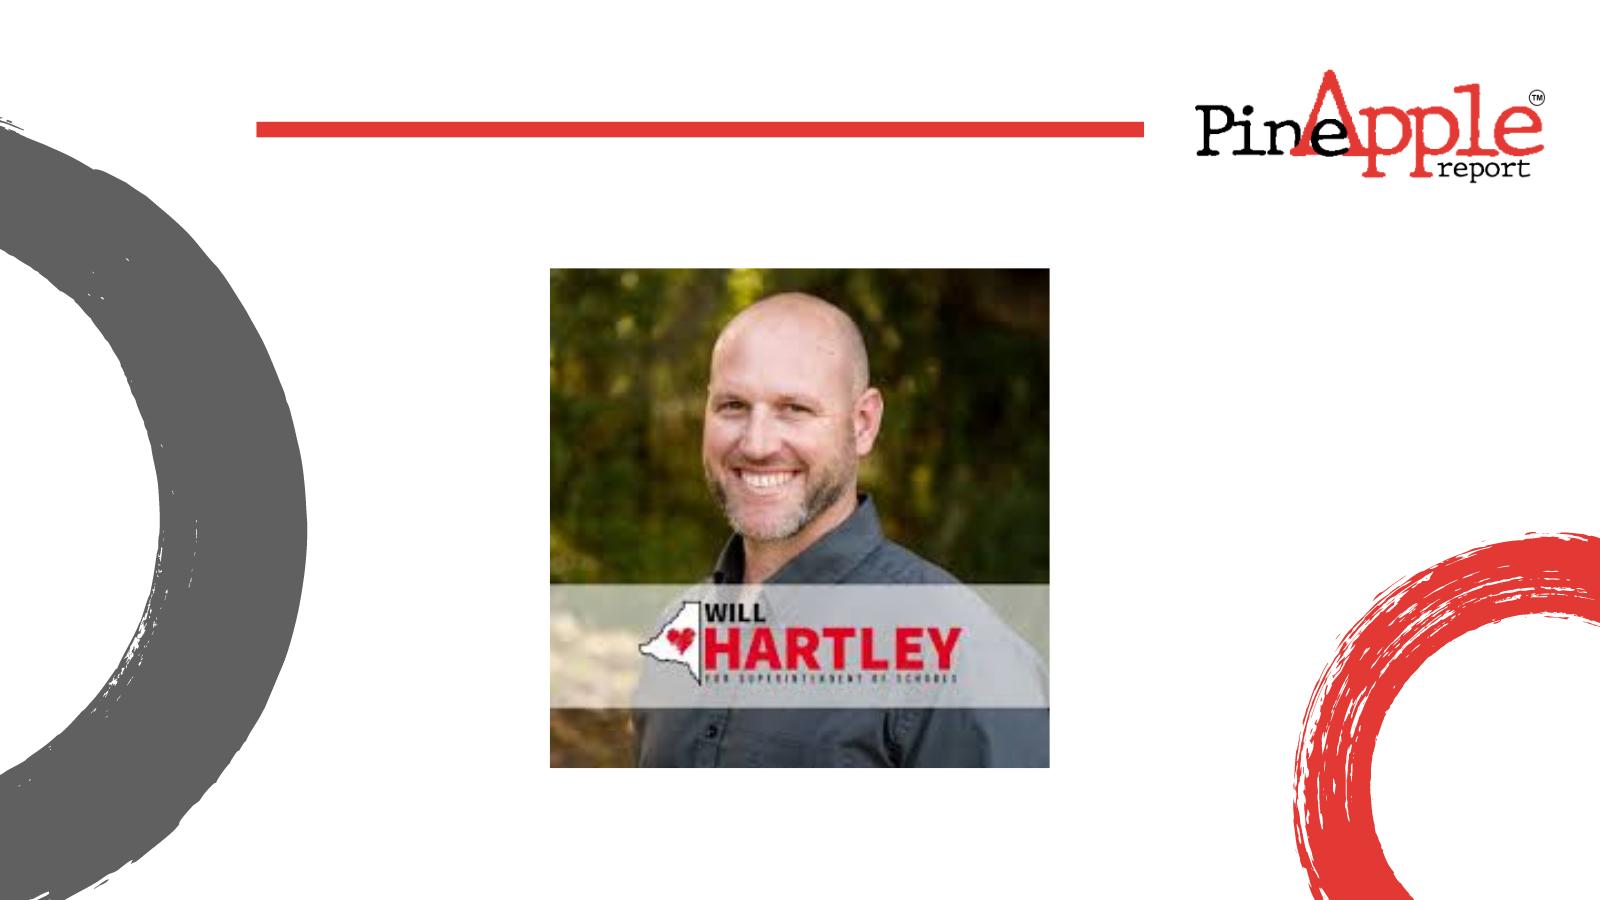 Badford County Schools New Superintendent Will Hartley